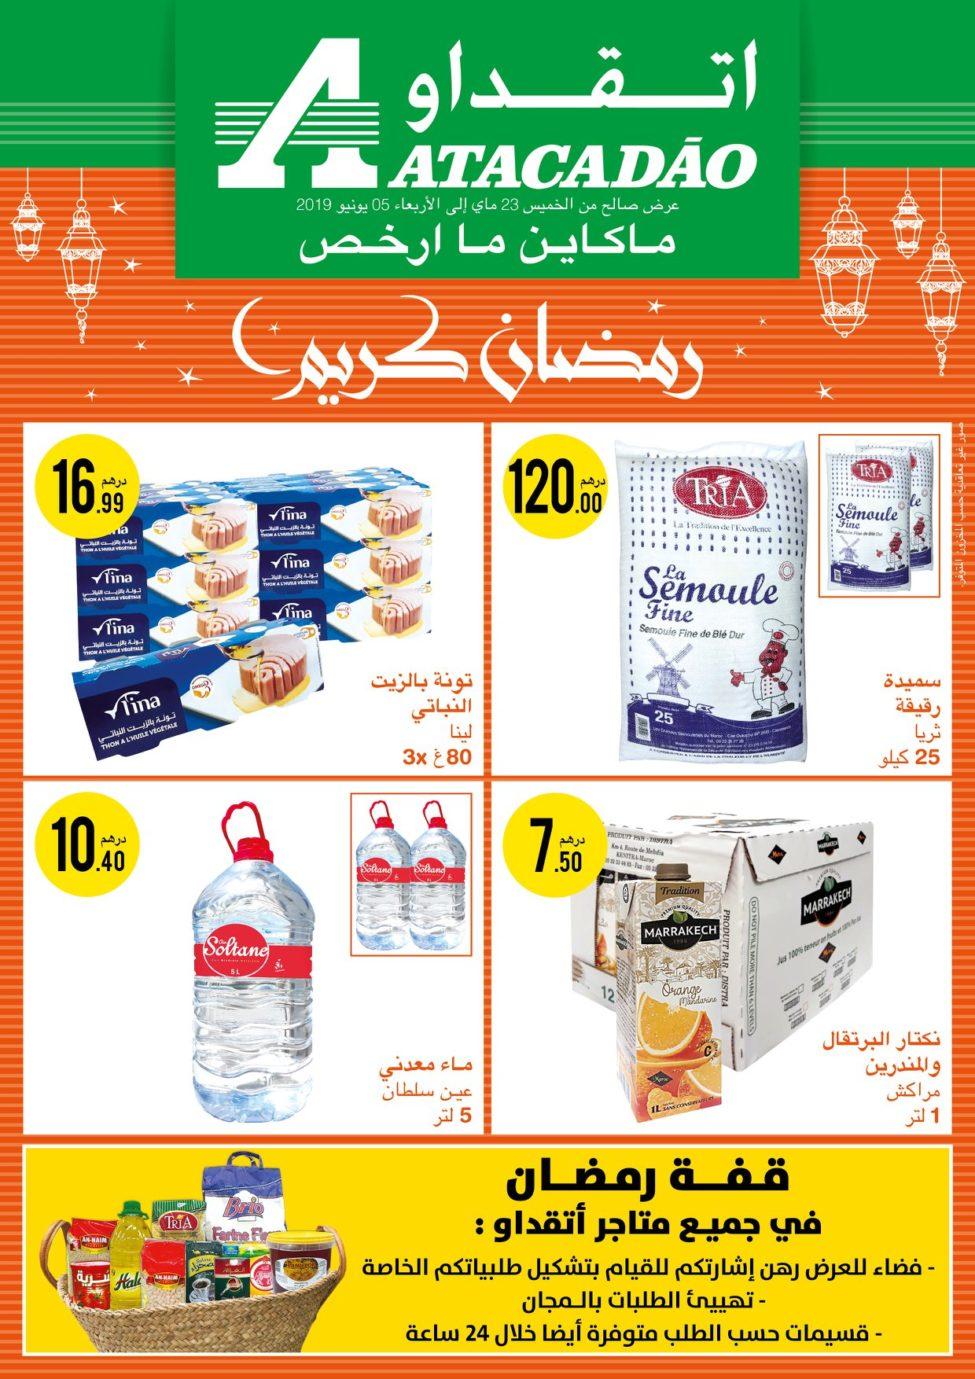 Catalogue Atacadao Maroc du 23 mai au 5 Juin 2019